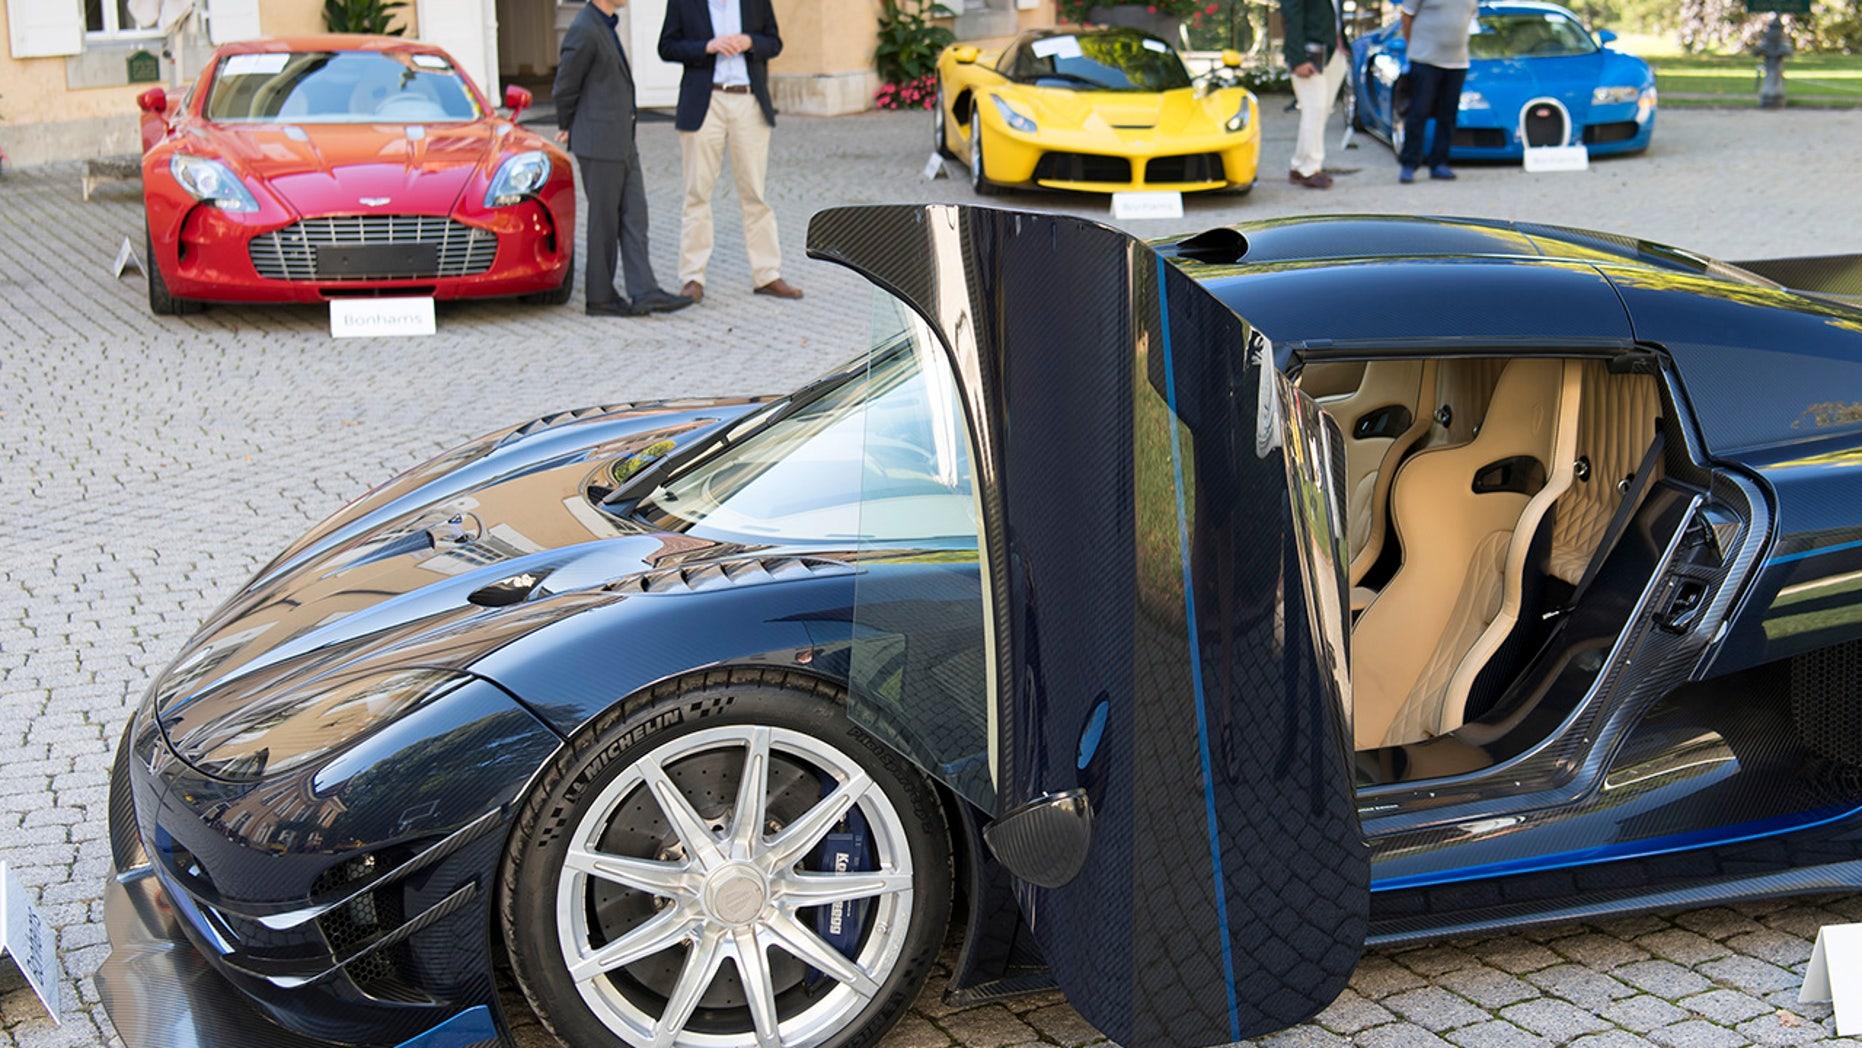 seized politician's exotic cars